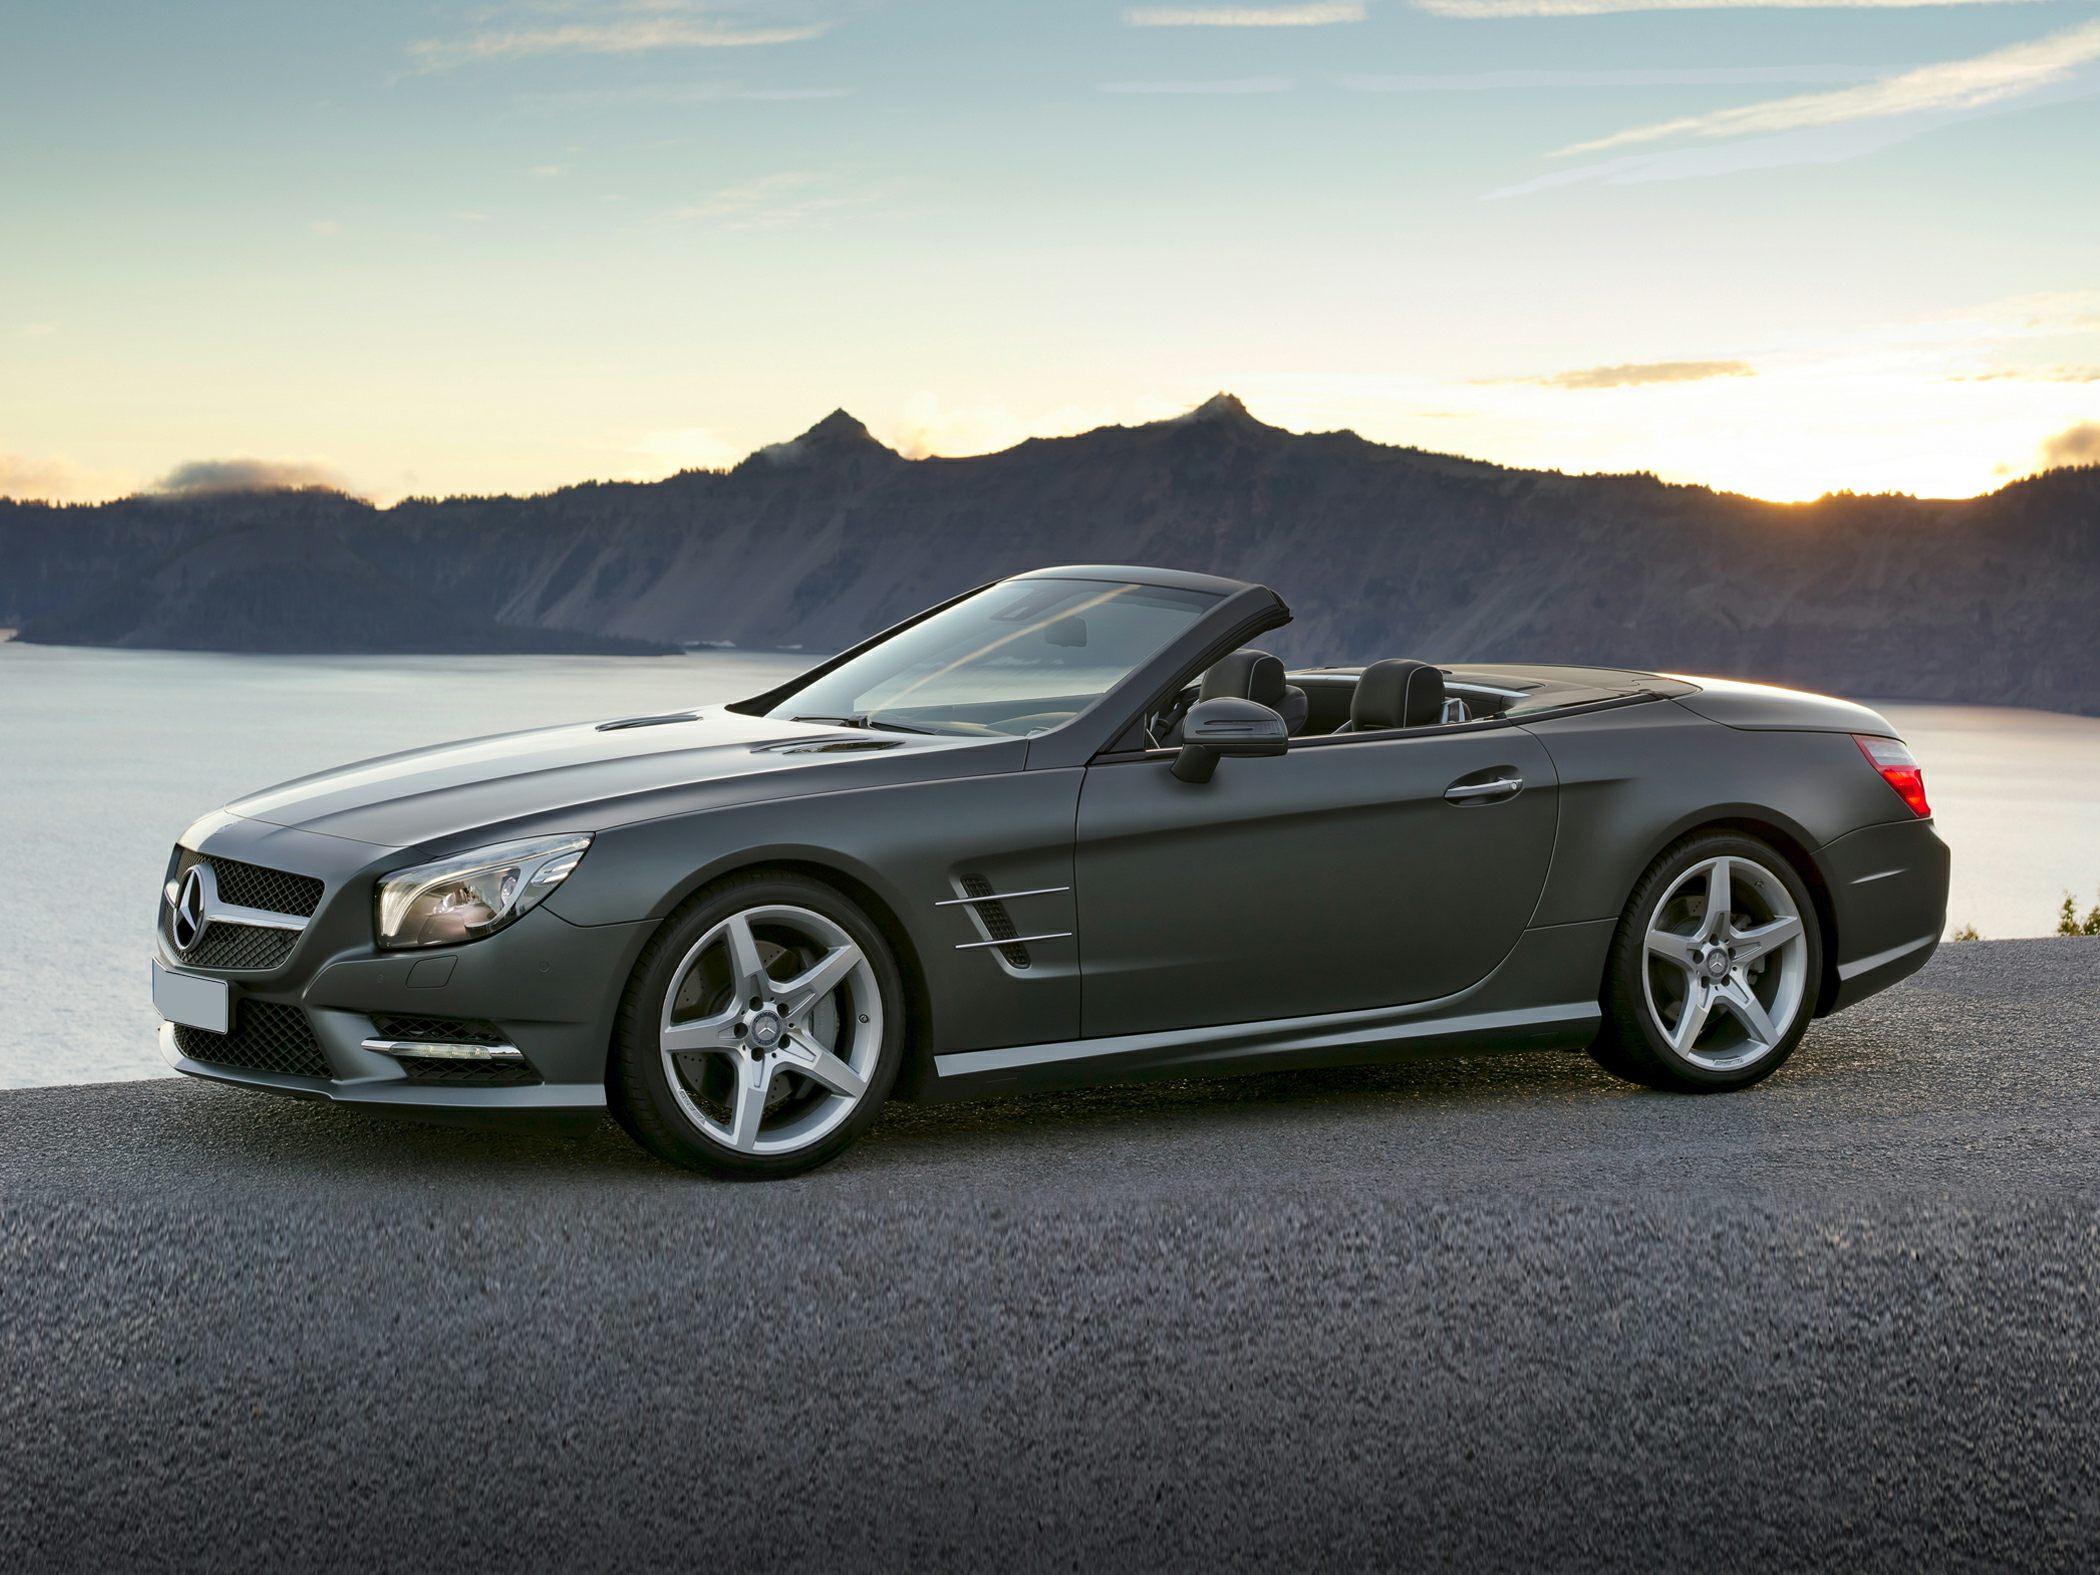 Mercedez-Benz SL550 Exterior